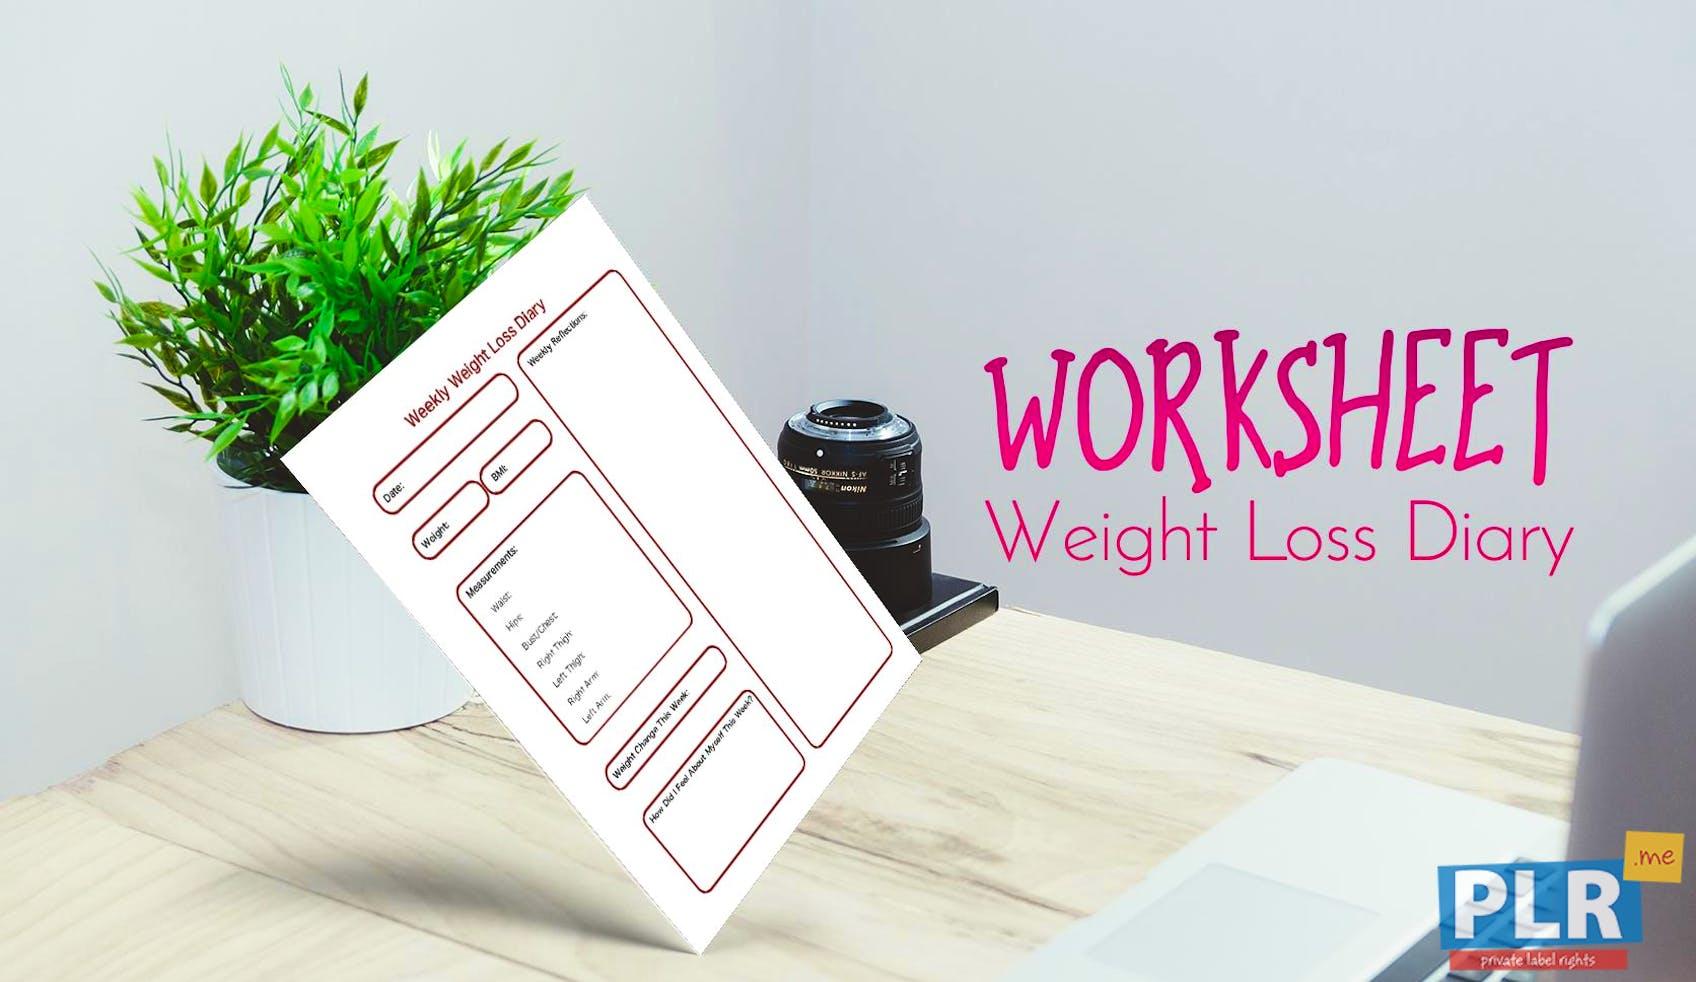 plr worksheets weight loss diary plr me